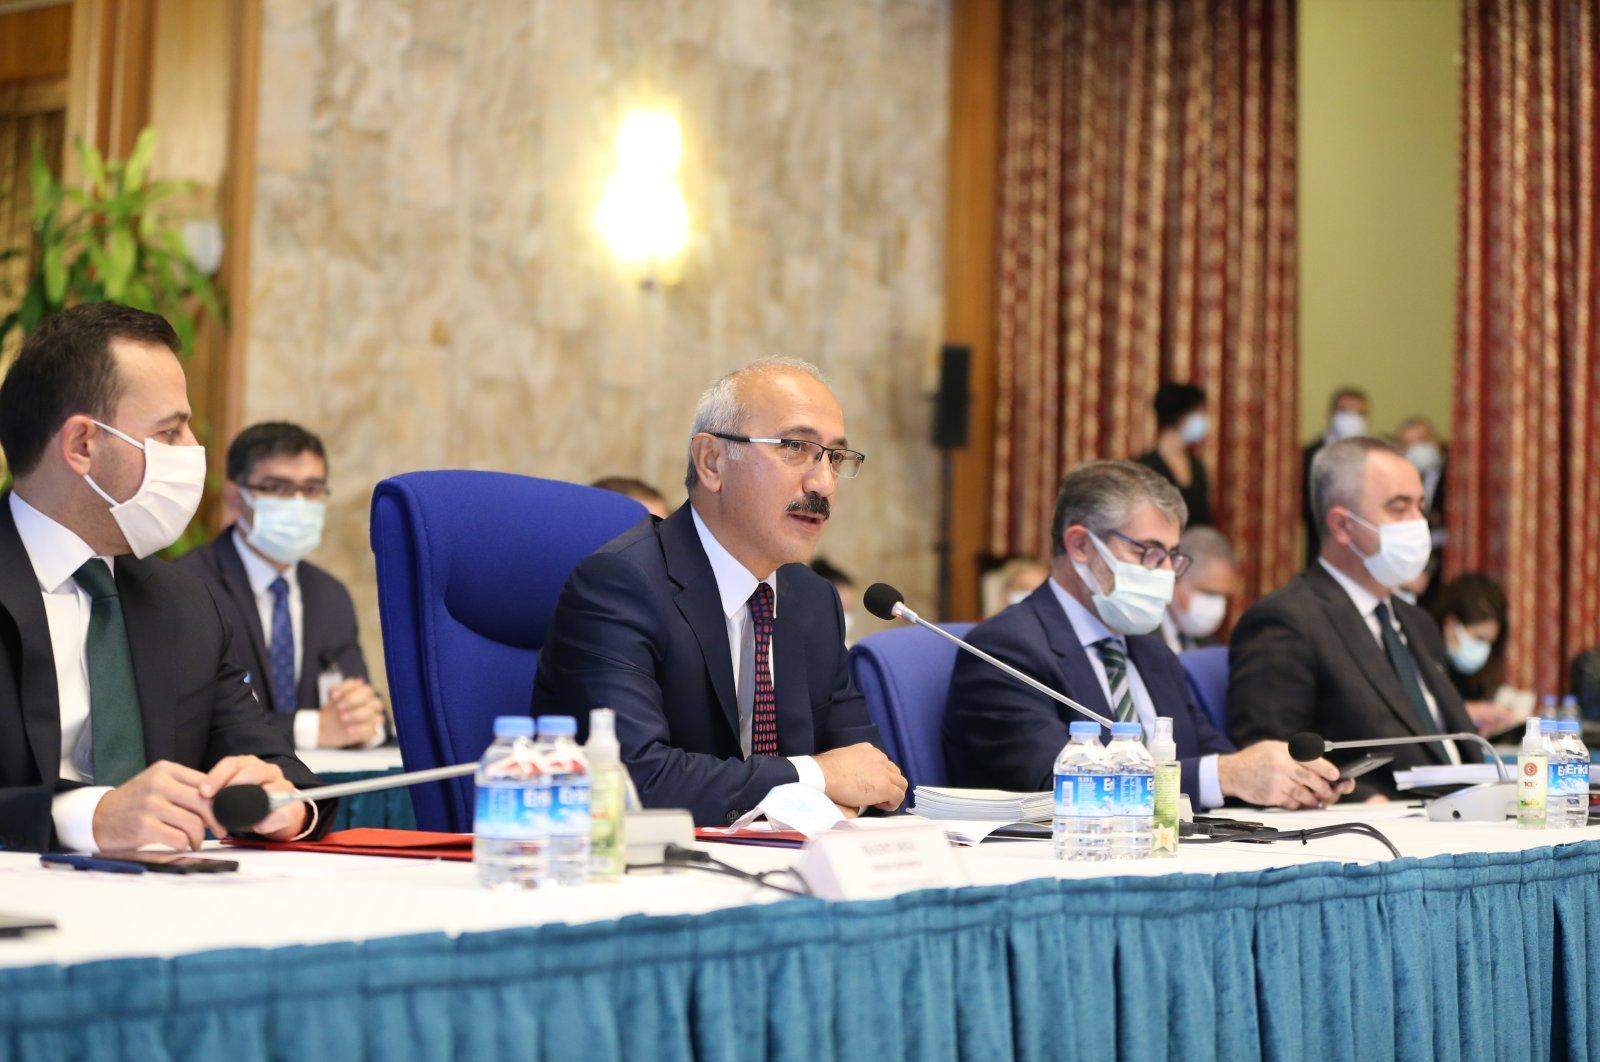 Treasury and Finance Minister Lütfi Elvan speaks at the 2021 budget meeting in the capital Ankara, Turkey, Nov. 17, 2020. (AA Photo)